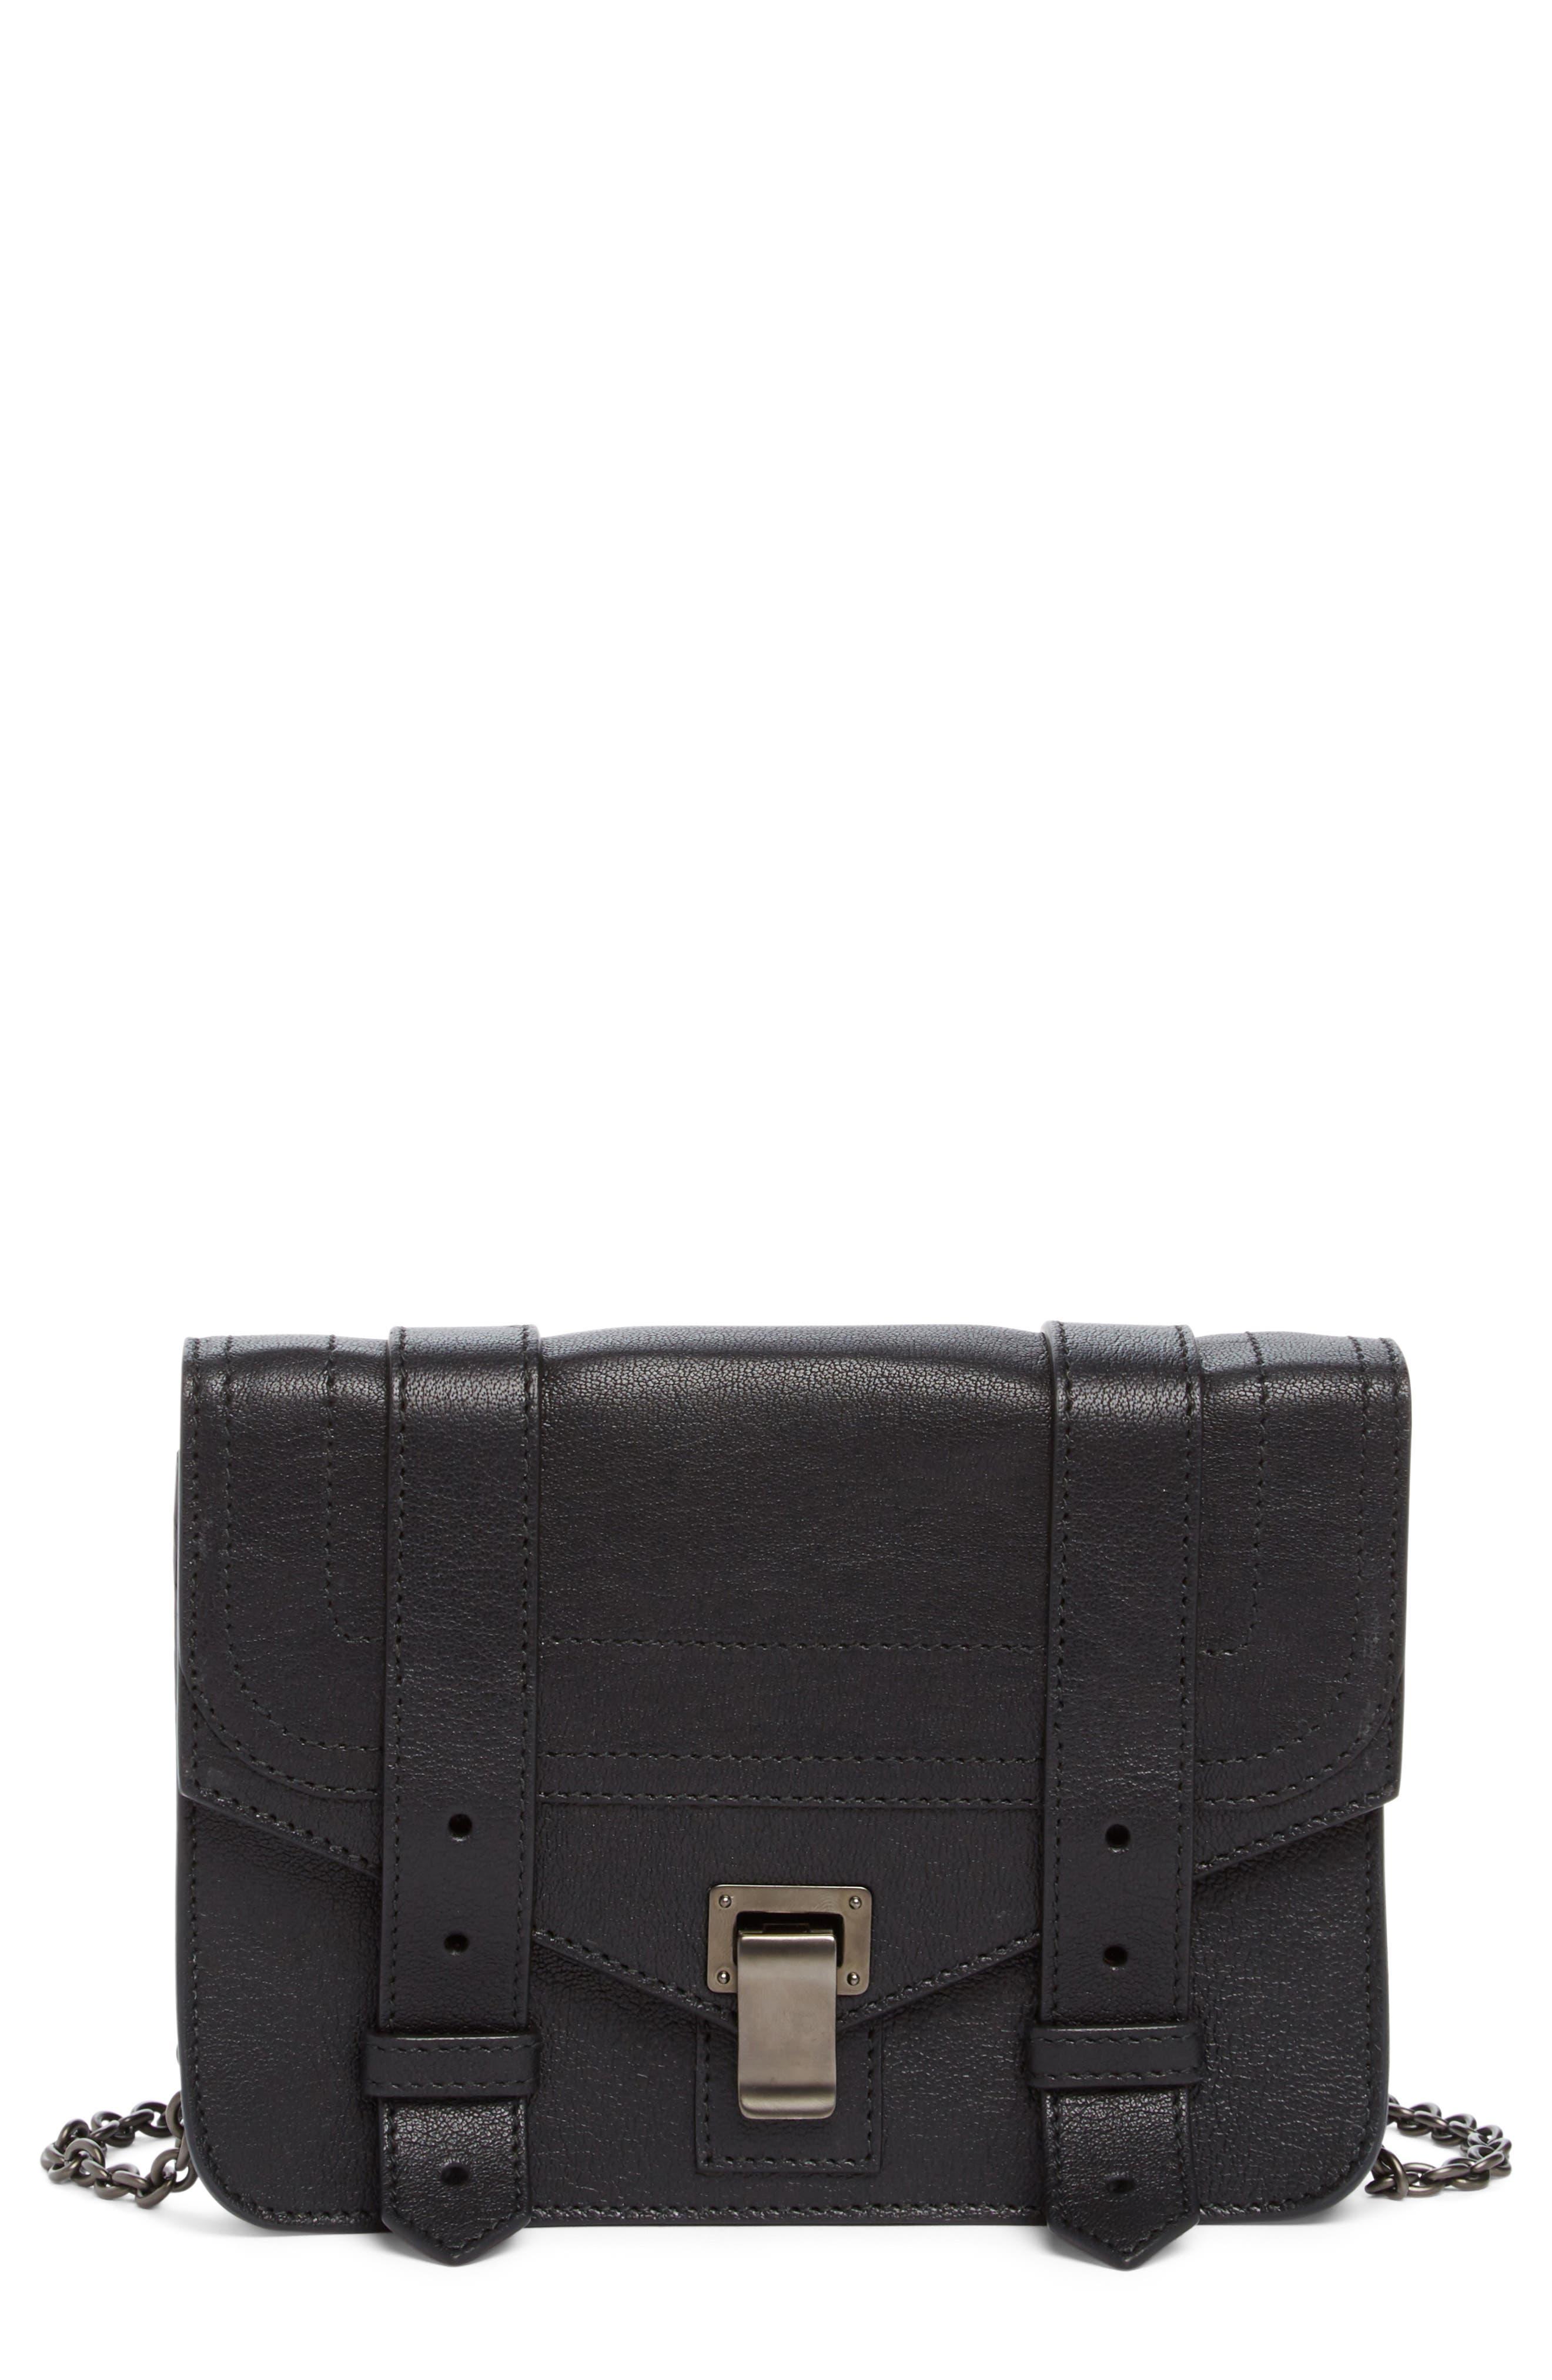 PROENZA SCHOULER, Tiny PS1+ Grainy Leather Satchel, Alternate thumbnail 7, color, BLACK